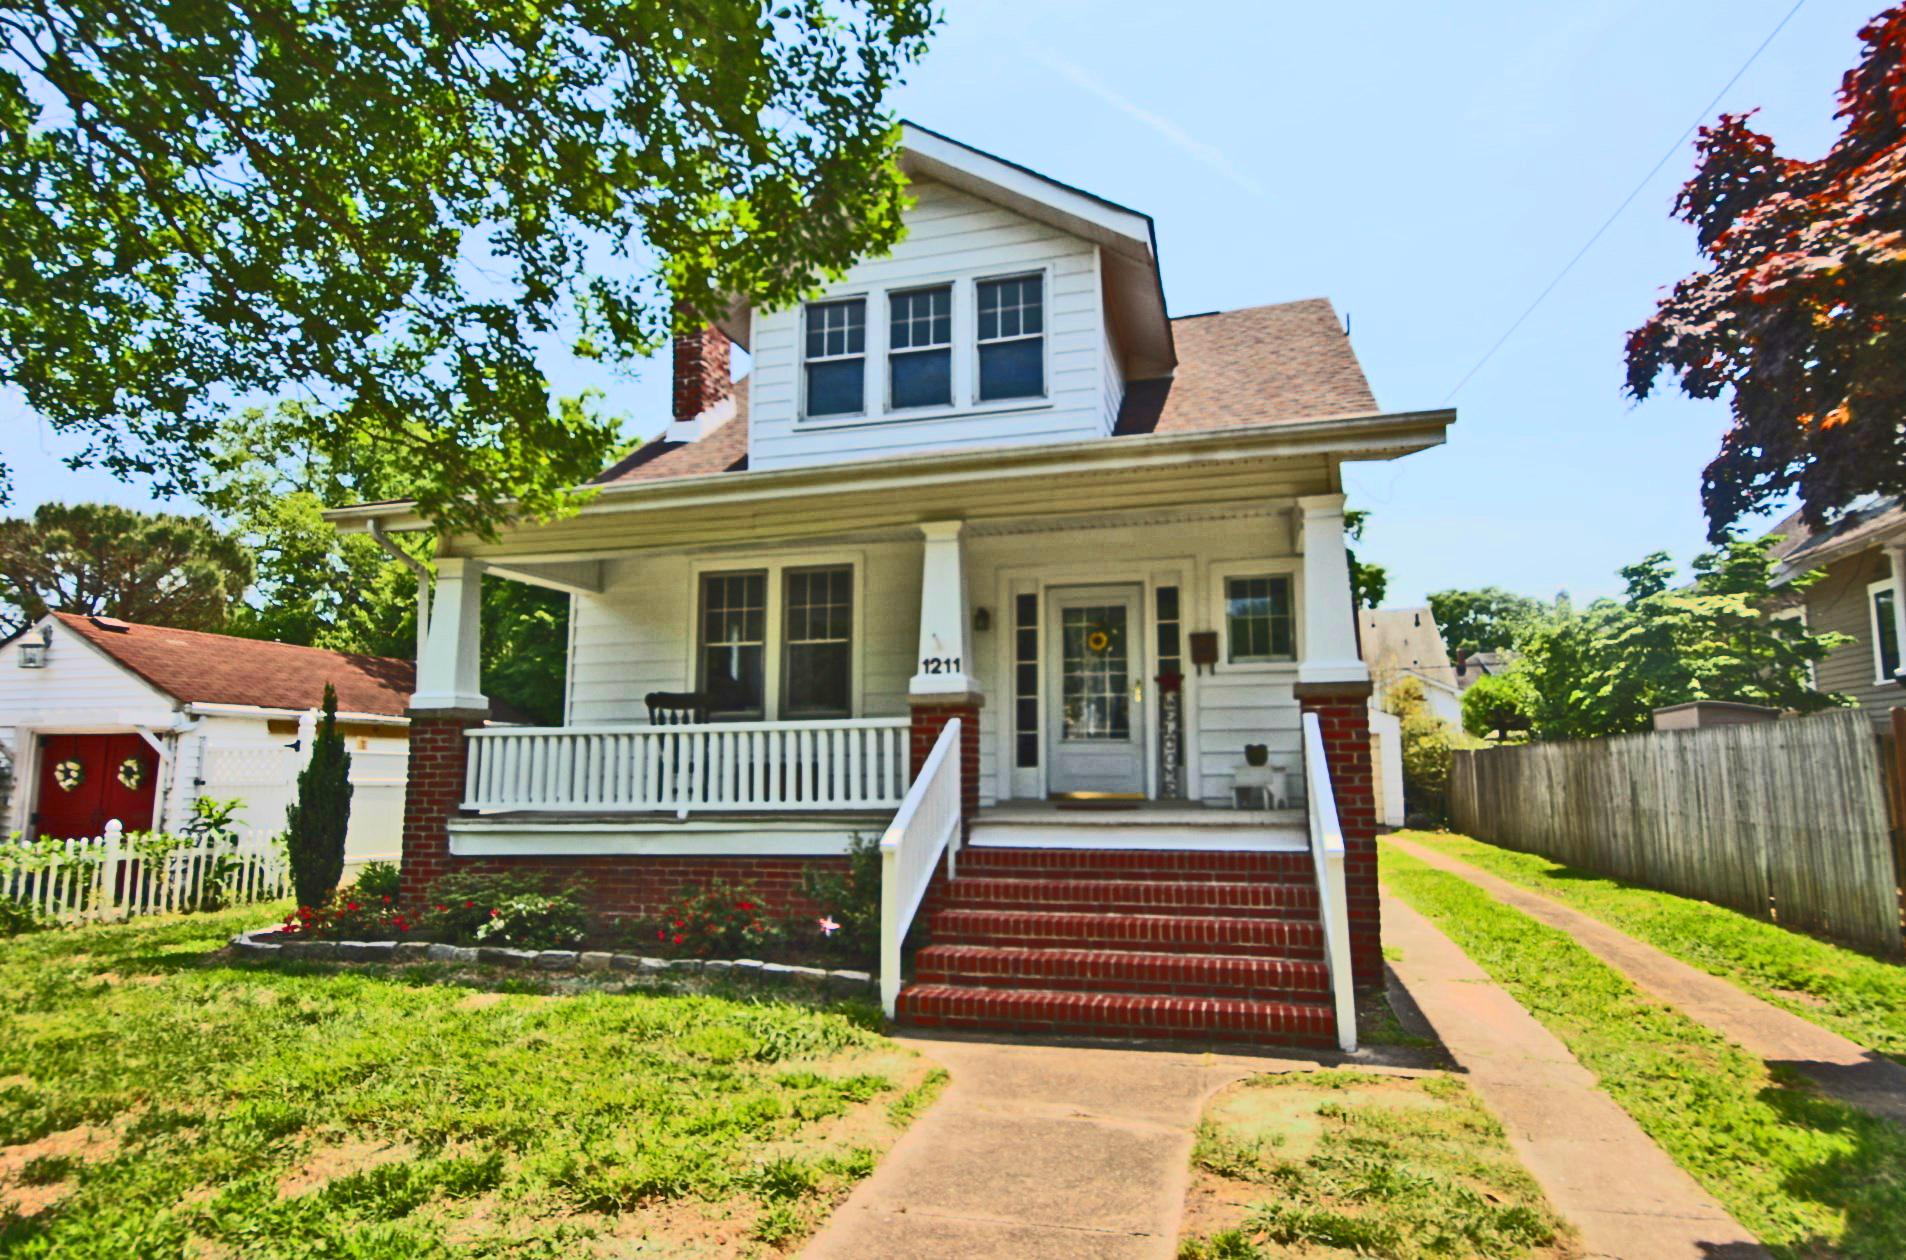 1211 Magnolia Avenue: Sold!